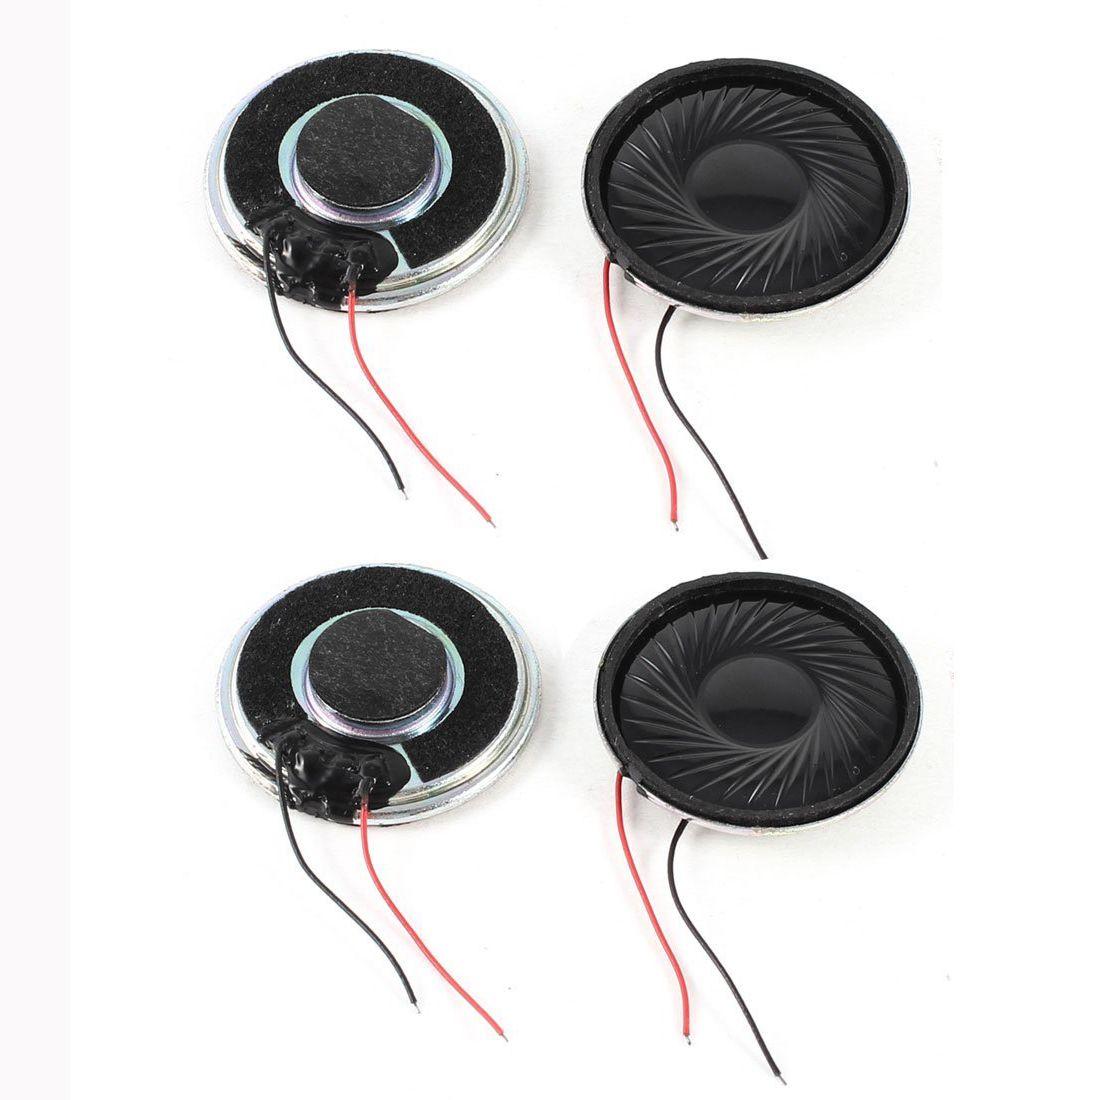 4 Pcs Internal Speakers Magnet 30mm 2800Hz 8Ohm 1W for PC Laptop